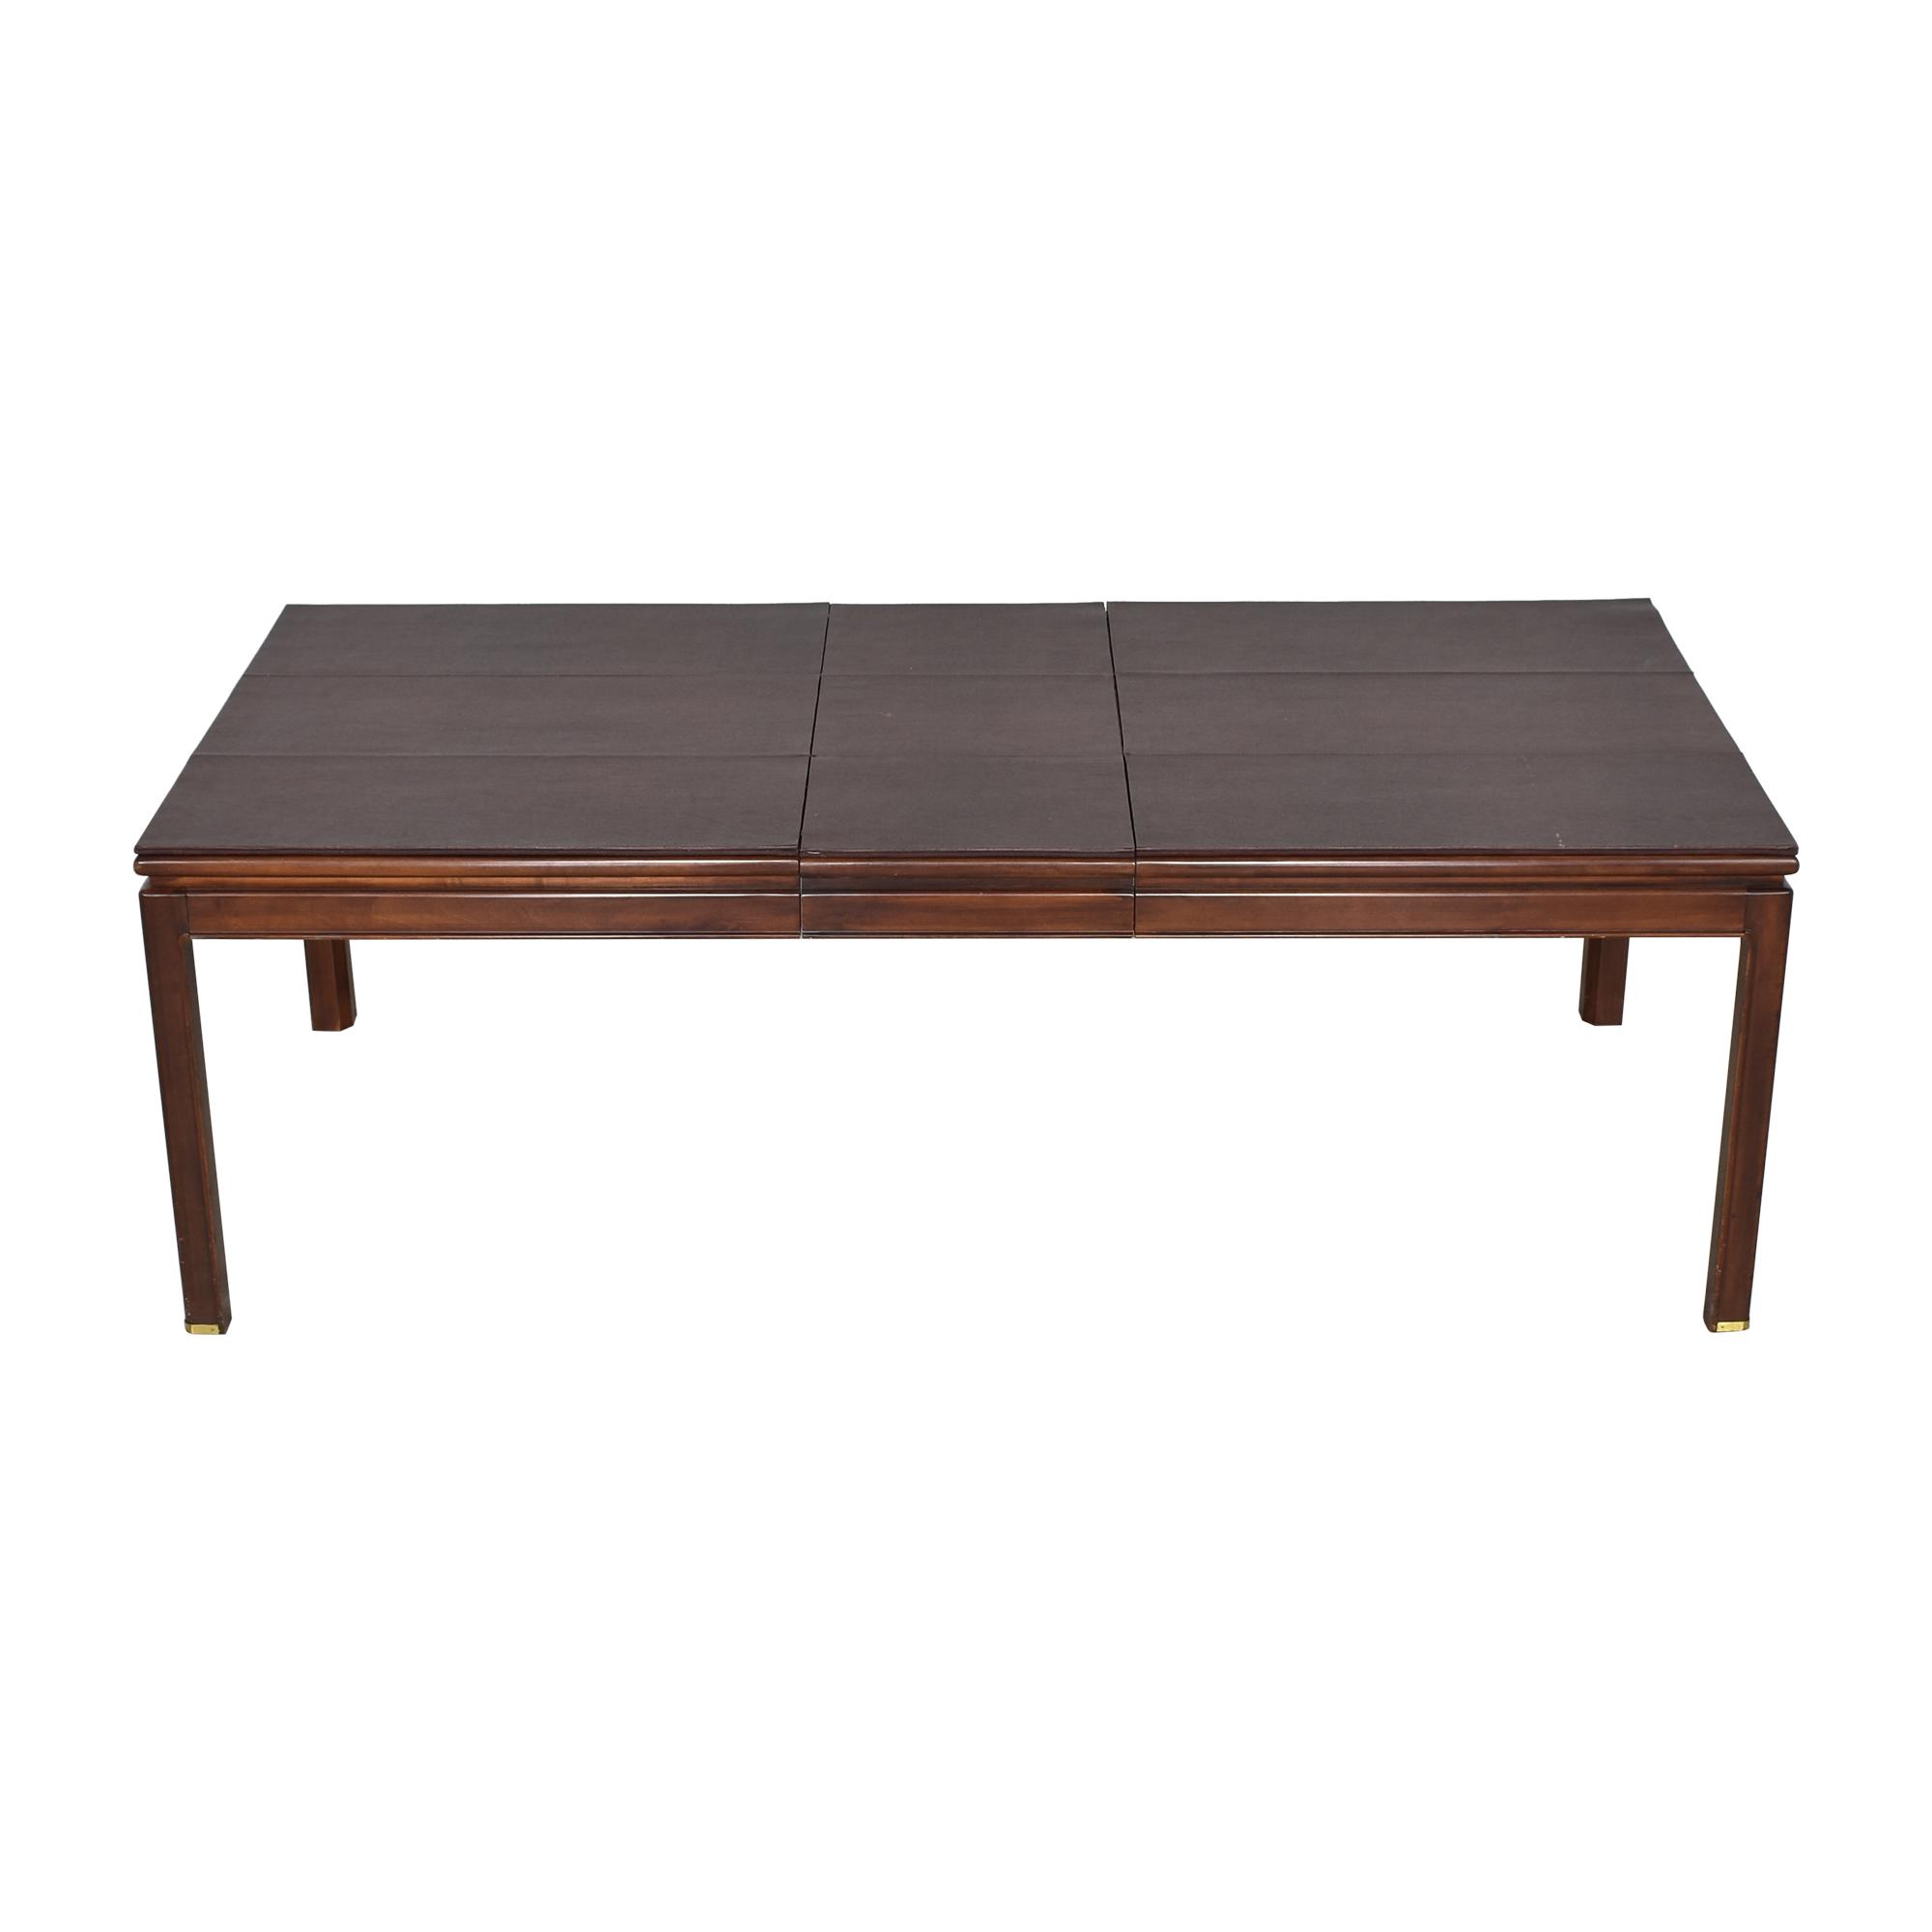 Bernhardt Bernhardt Extendable Dining Table used